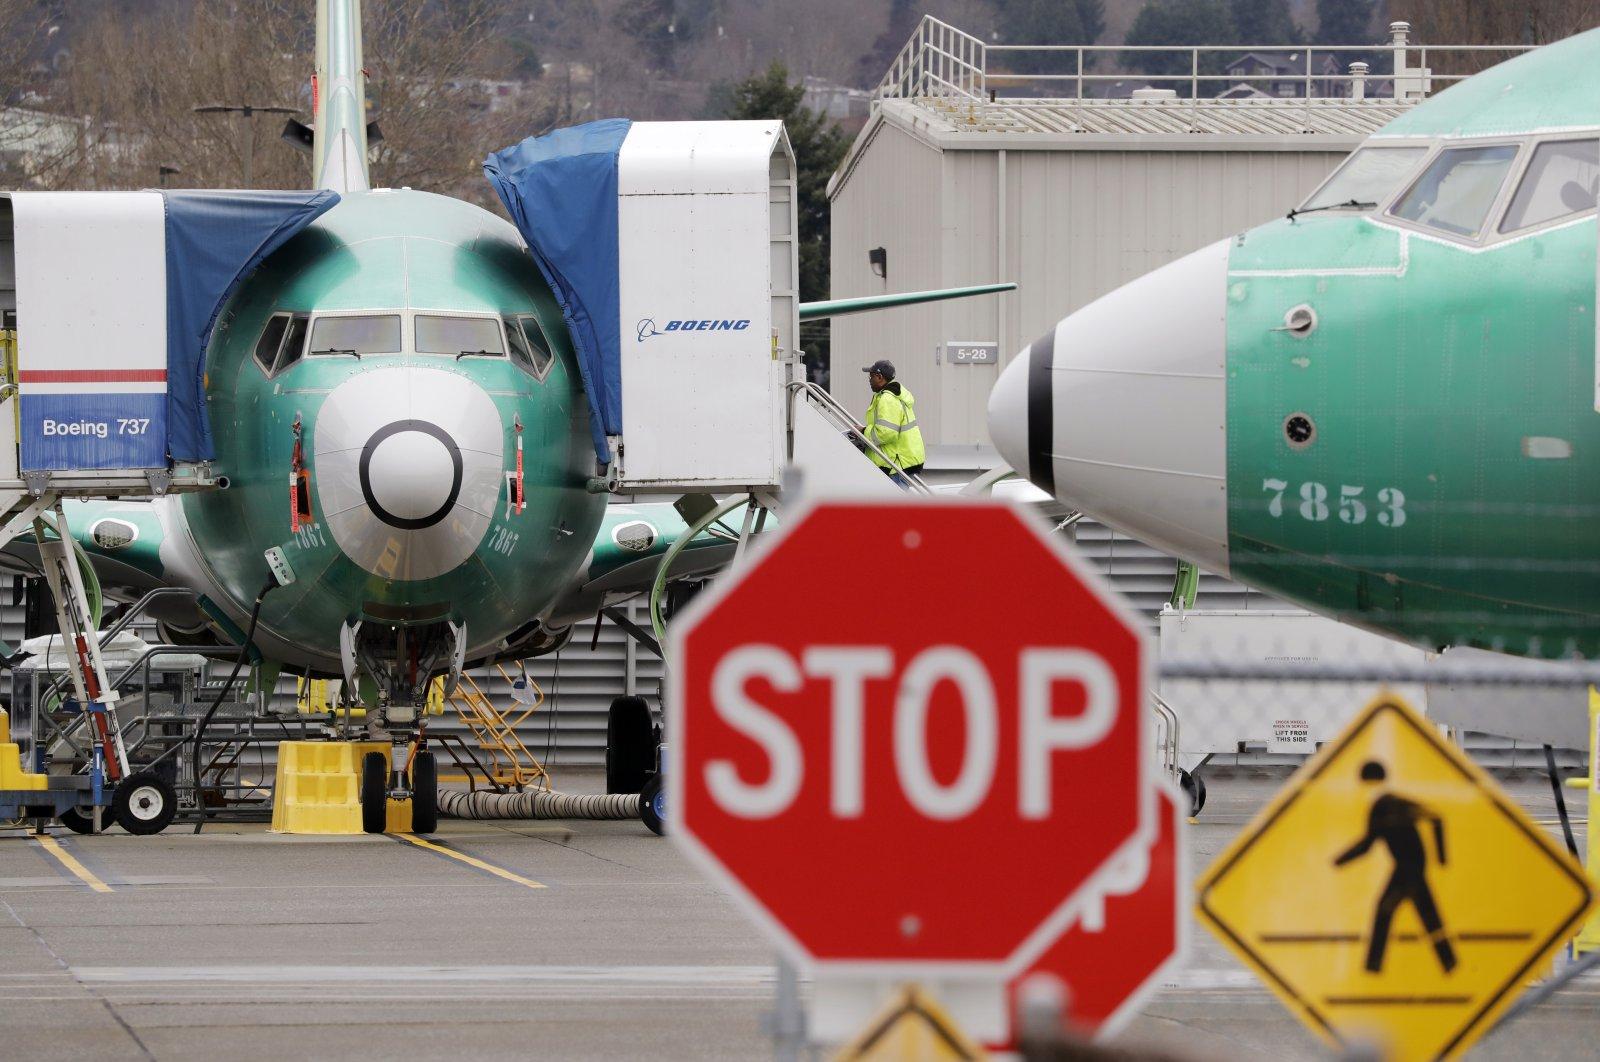 Boeing 737 MAX jets sit parked in Renton, Washington, Dec. 16, 2019. (AP Photo)